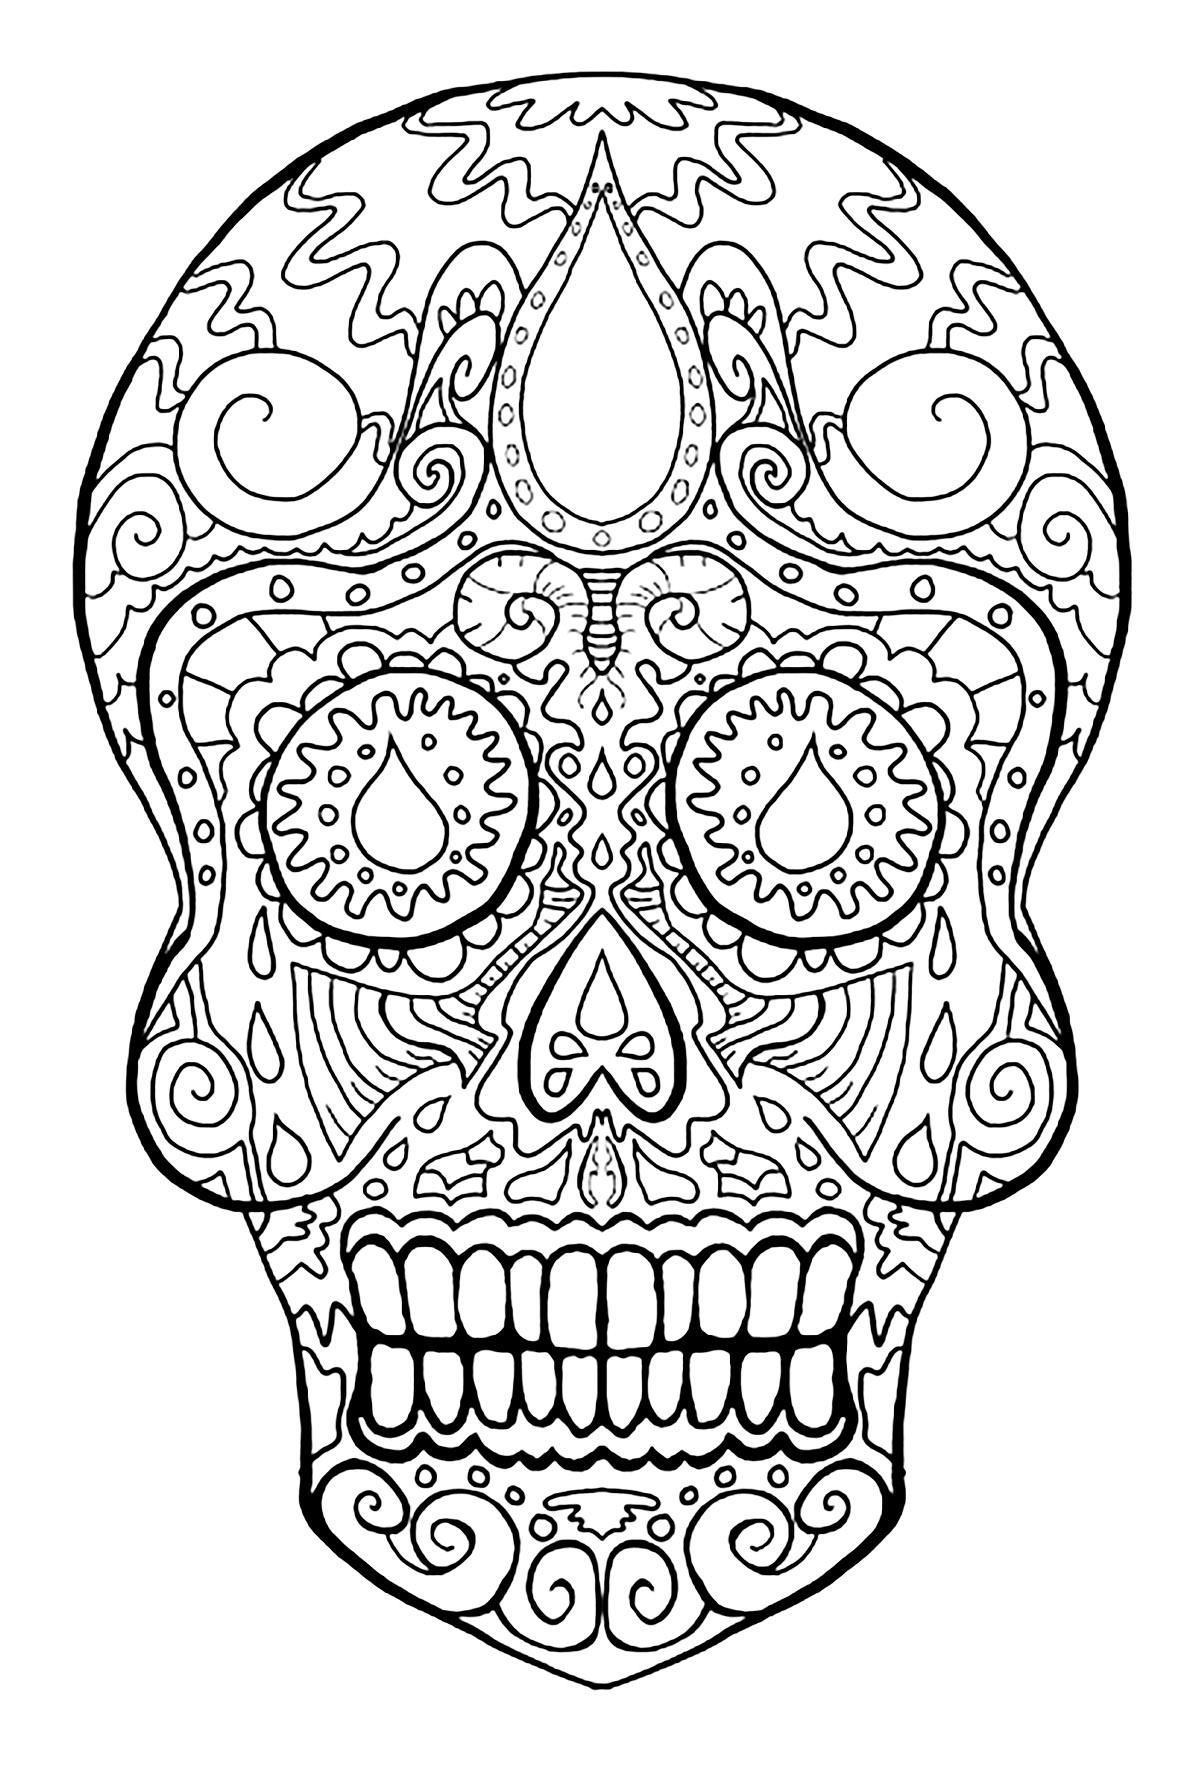 Simple Dia De Los Muertos (Day Of The Dead) coloring page for children